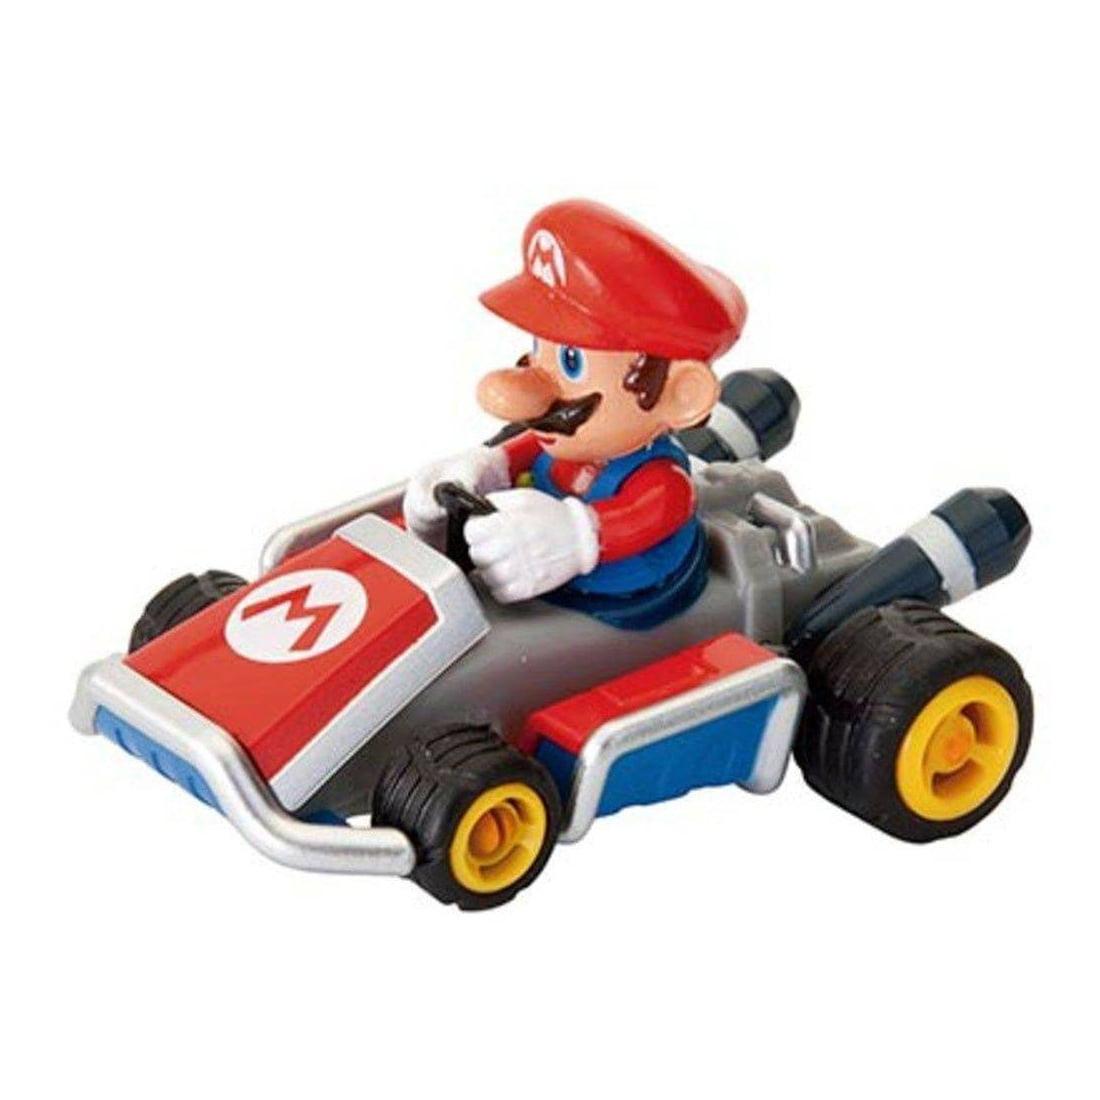 Mario Kart 7 - Mario